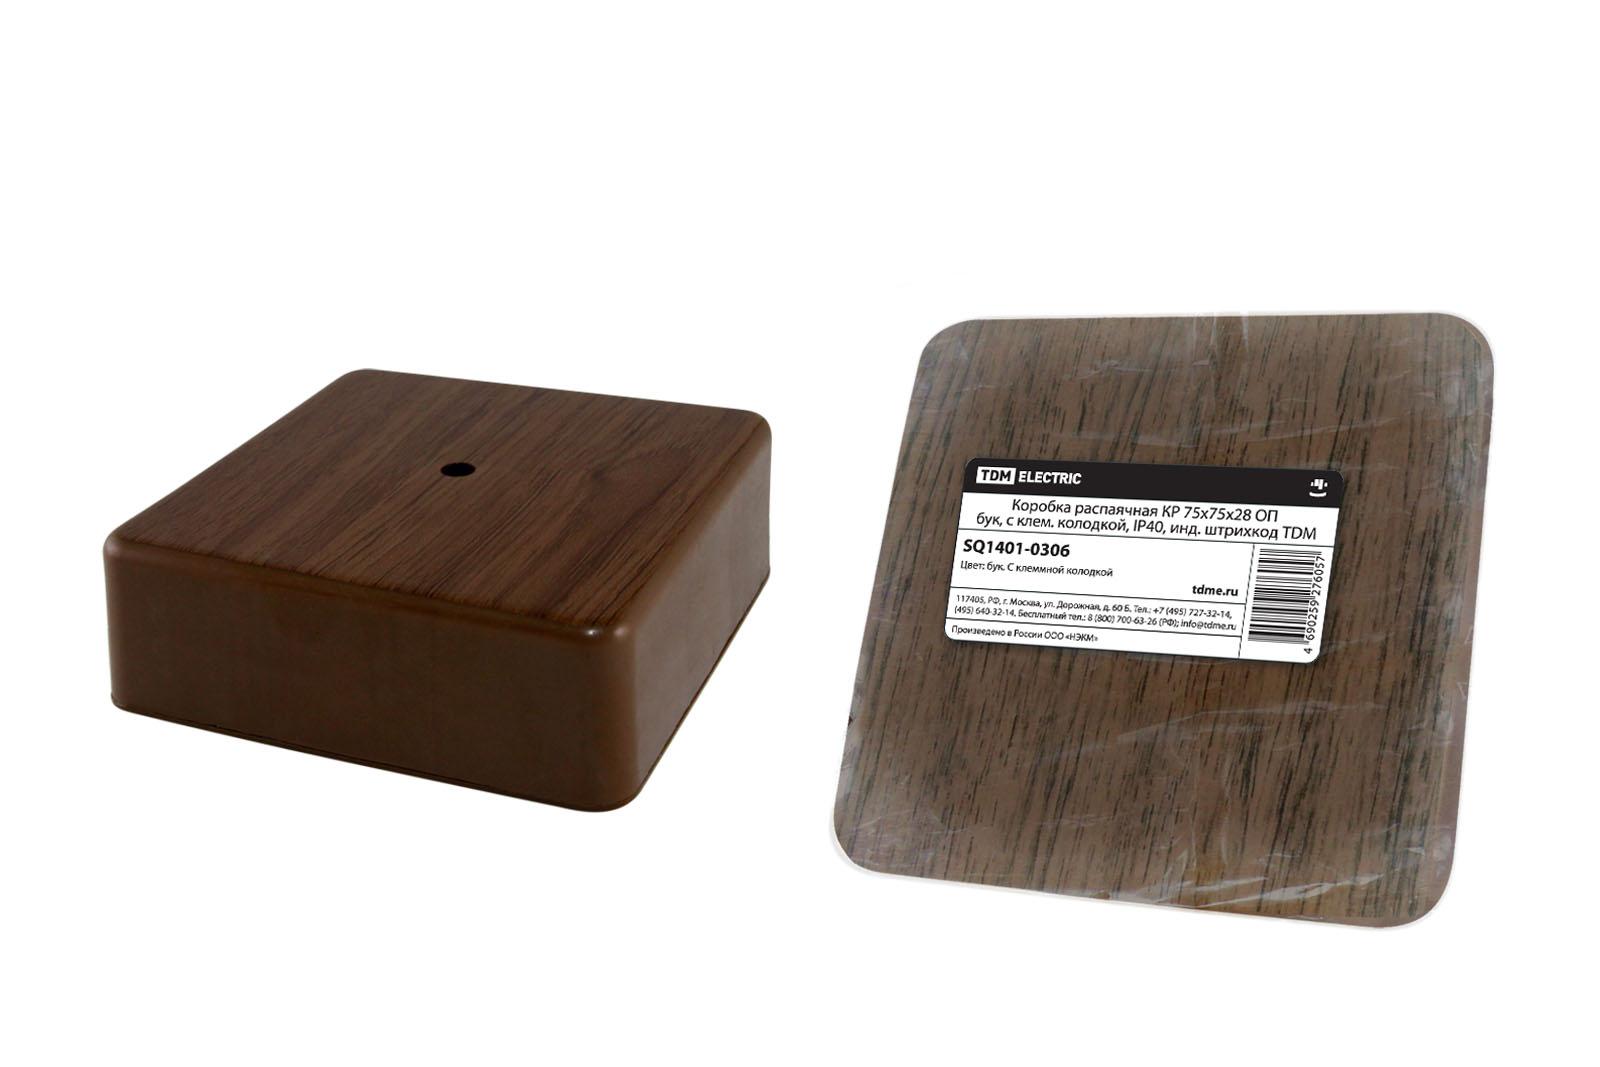 Фото Коробка распаячная КР 75х75х28 ОП бук, с клем. колодкой, IP40, инд. штрихкод TDM {SQ1401-0306}